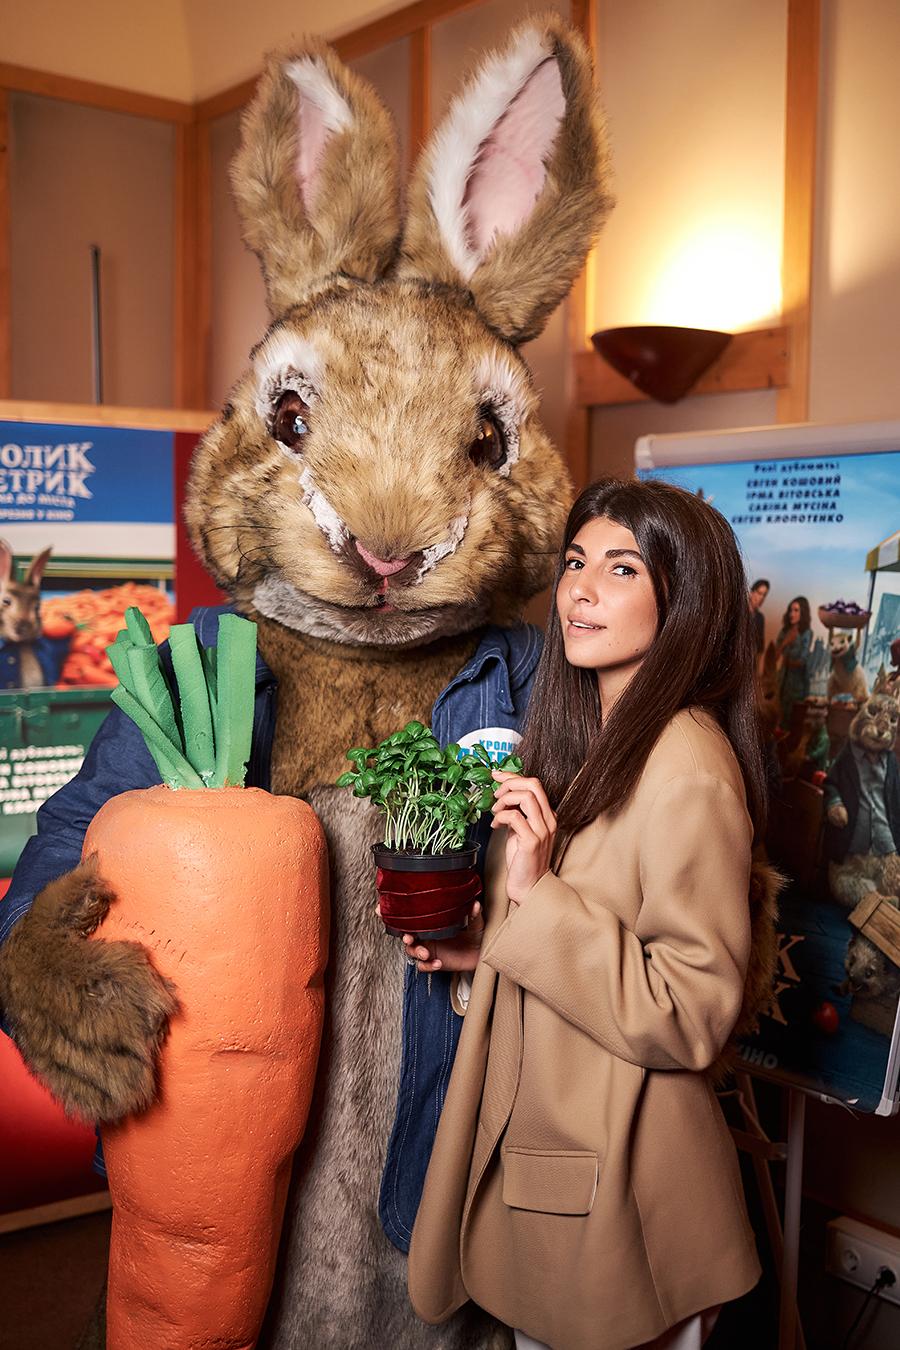 Сабина Мусина кролик петрик озвучка дубляж блогер G Bar